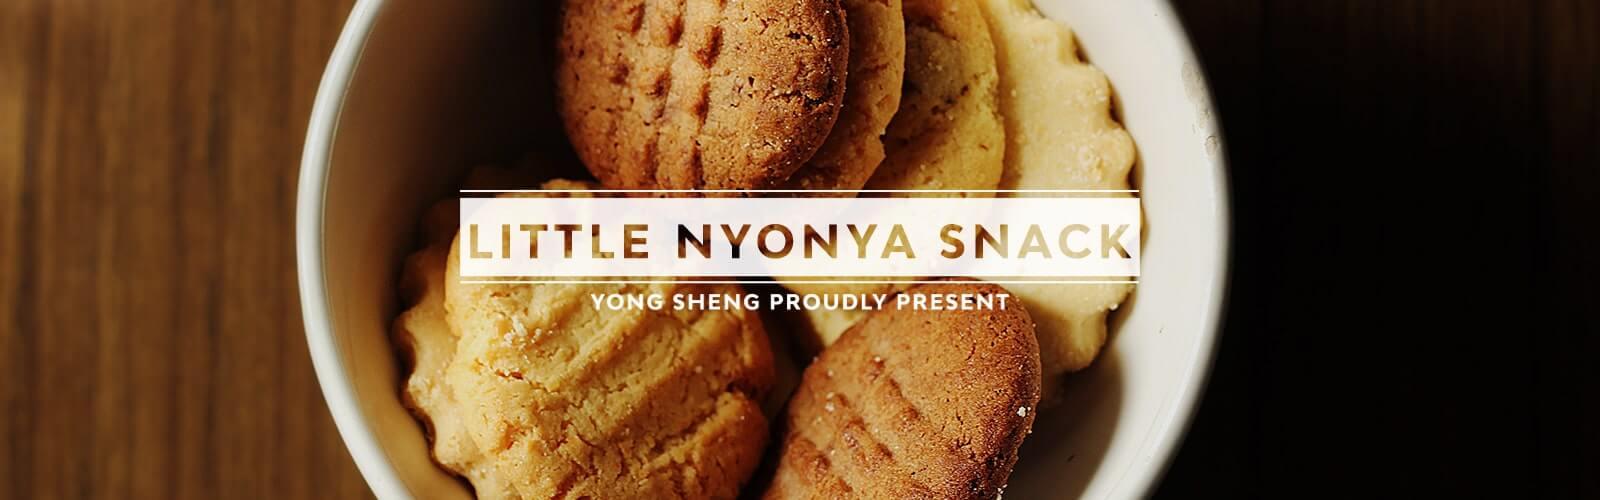 Little Nyonya Snack Series